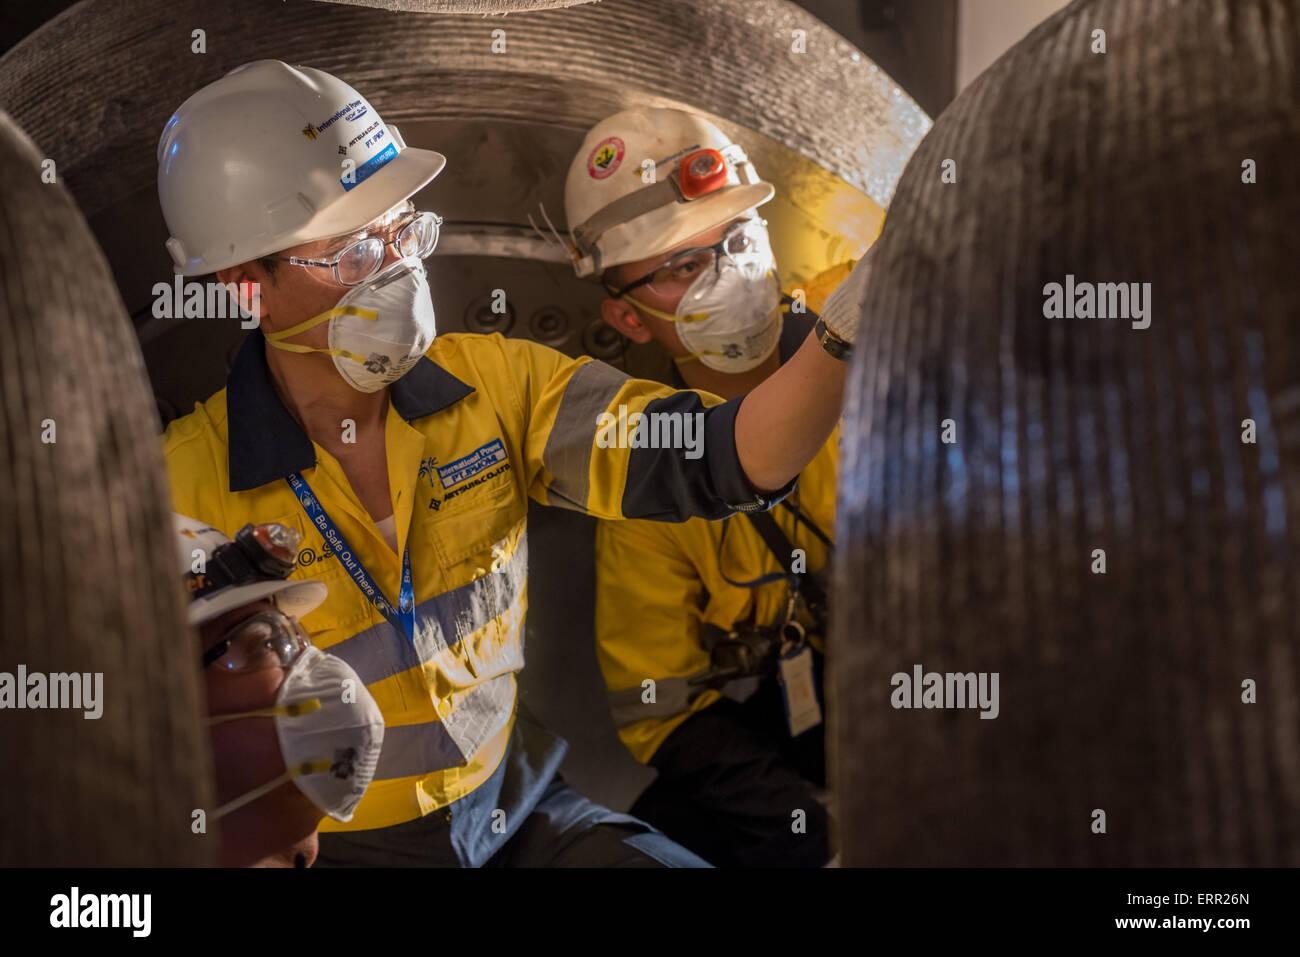 Maintenance activity at power plant facility. - Stock Image